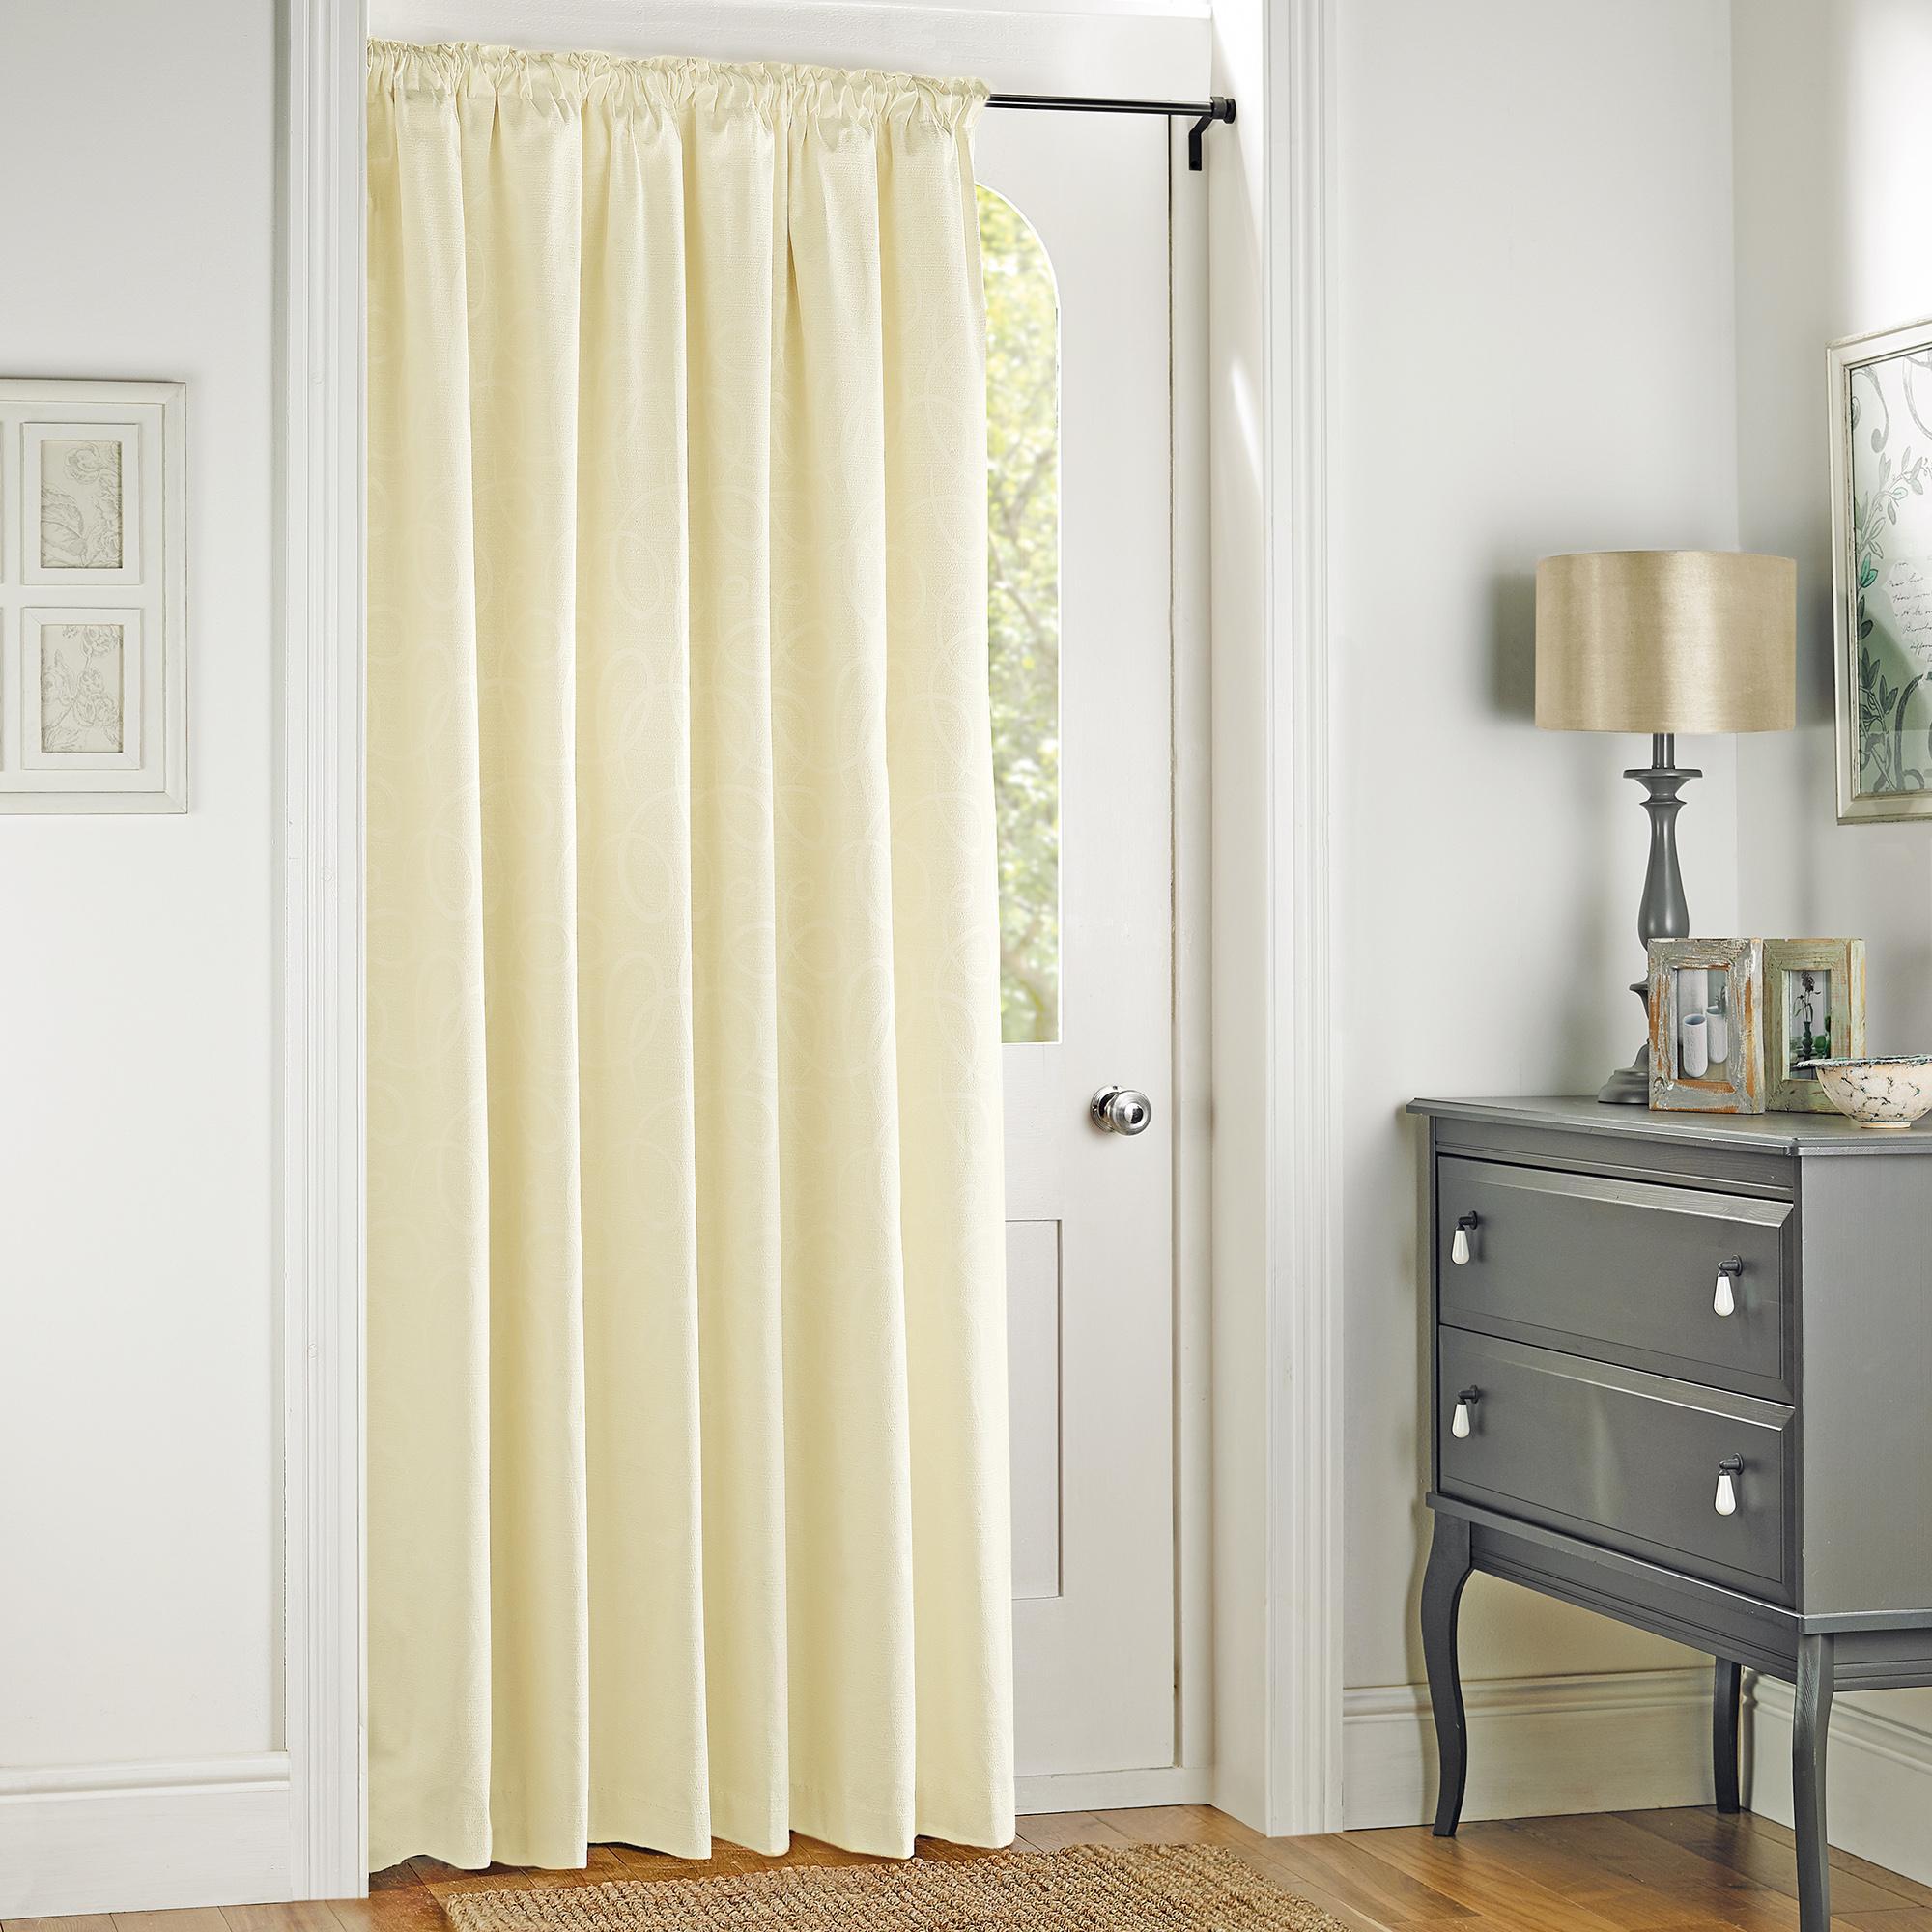 Yellow interior curtain for etrance door